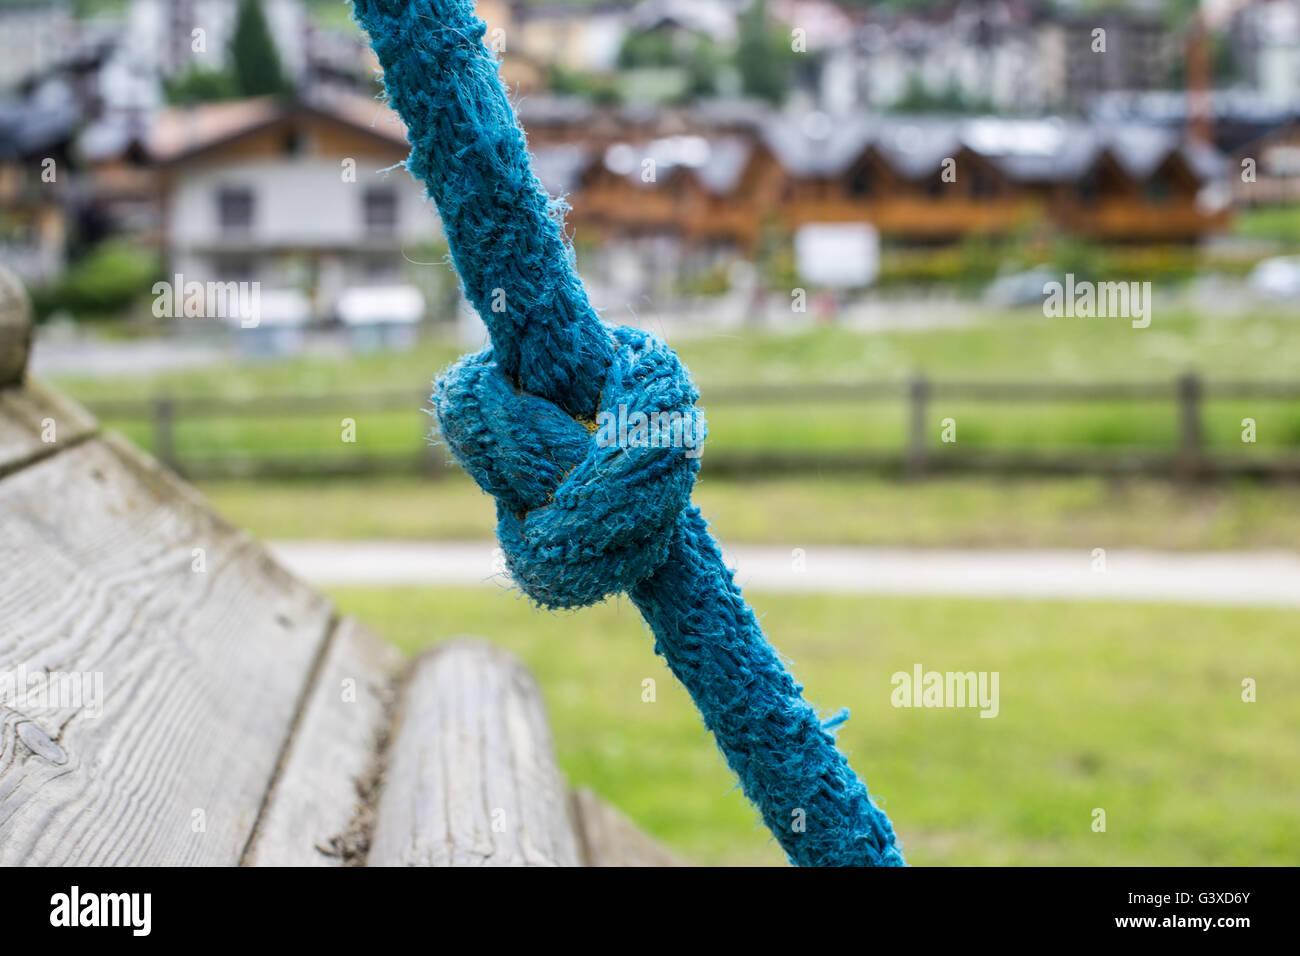 Blauen Seil Knoten am Spielplatz Stockbild